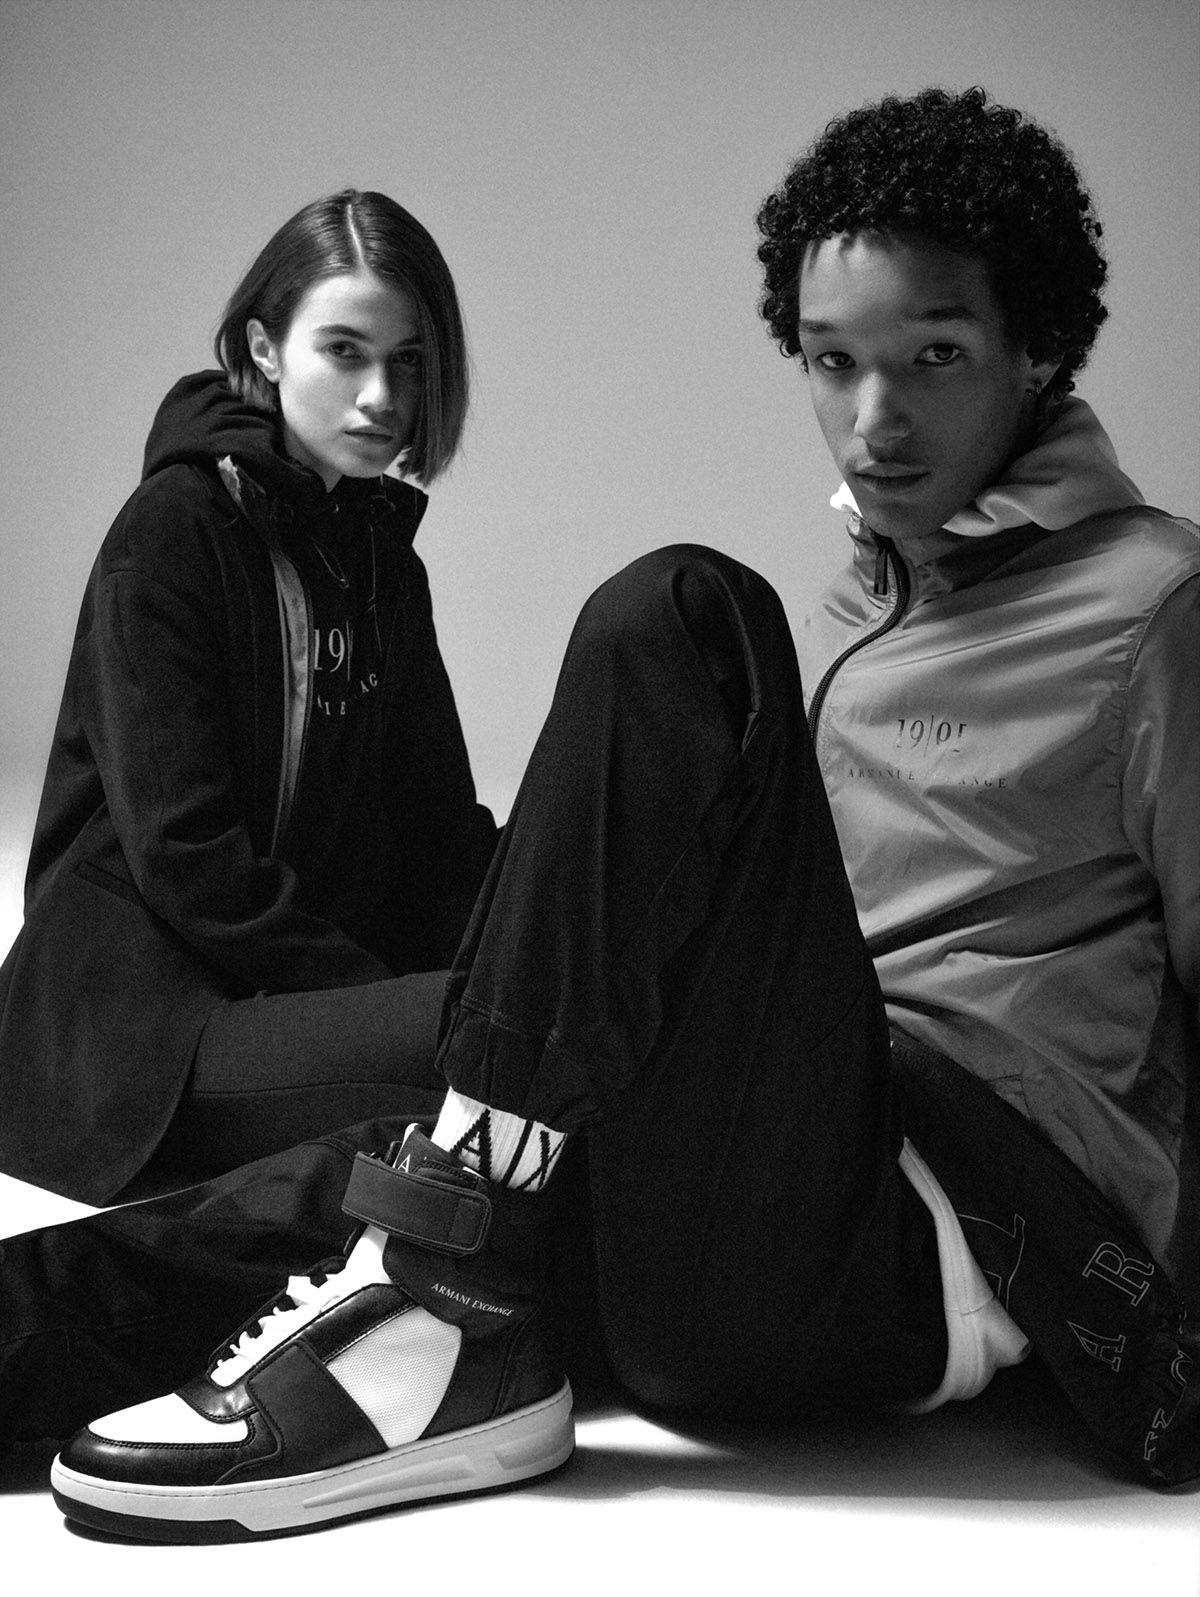 A|X Armani Exchange Looks Back on Three Decades of Era-Defining Fashion